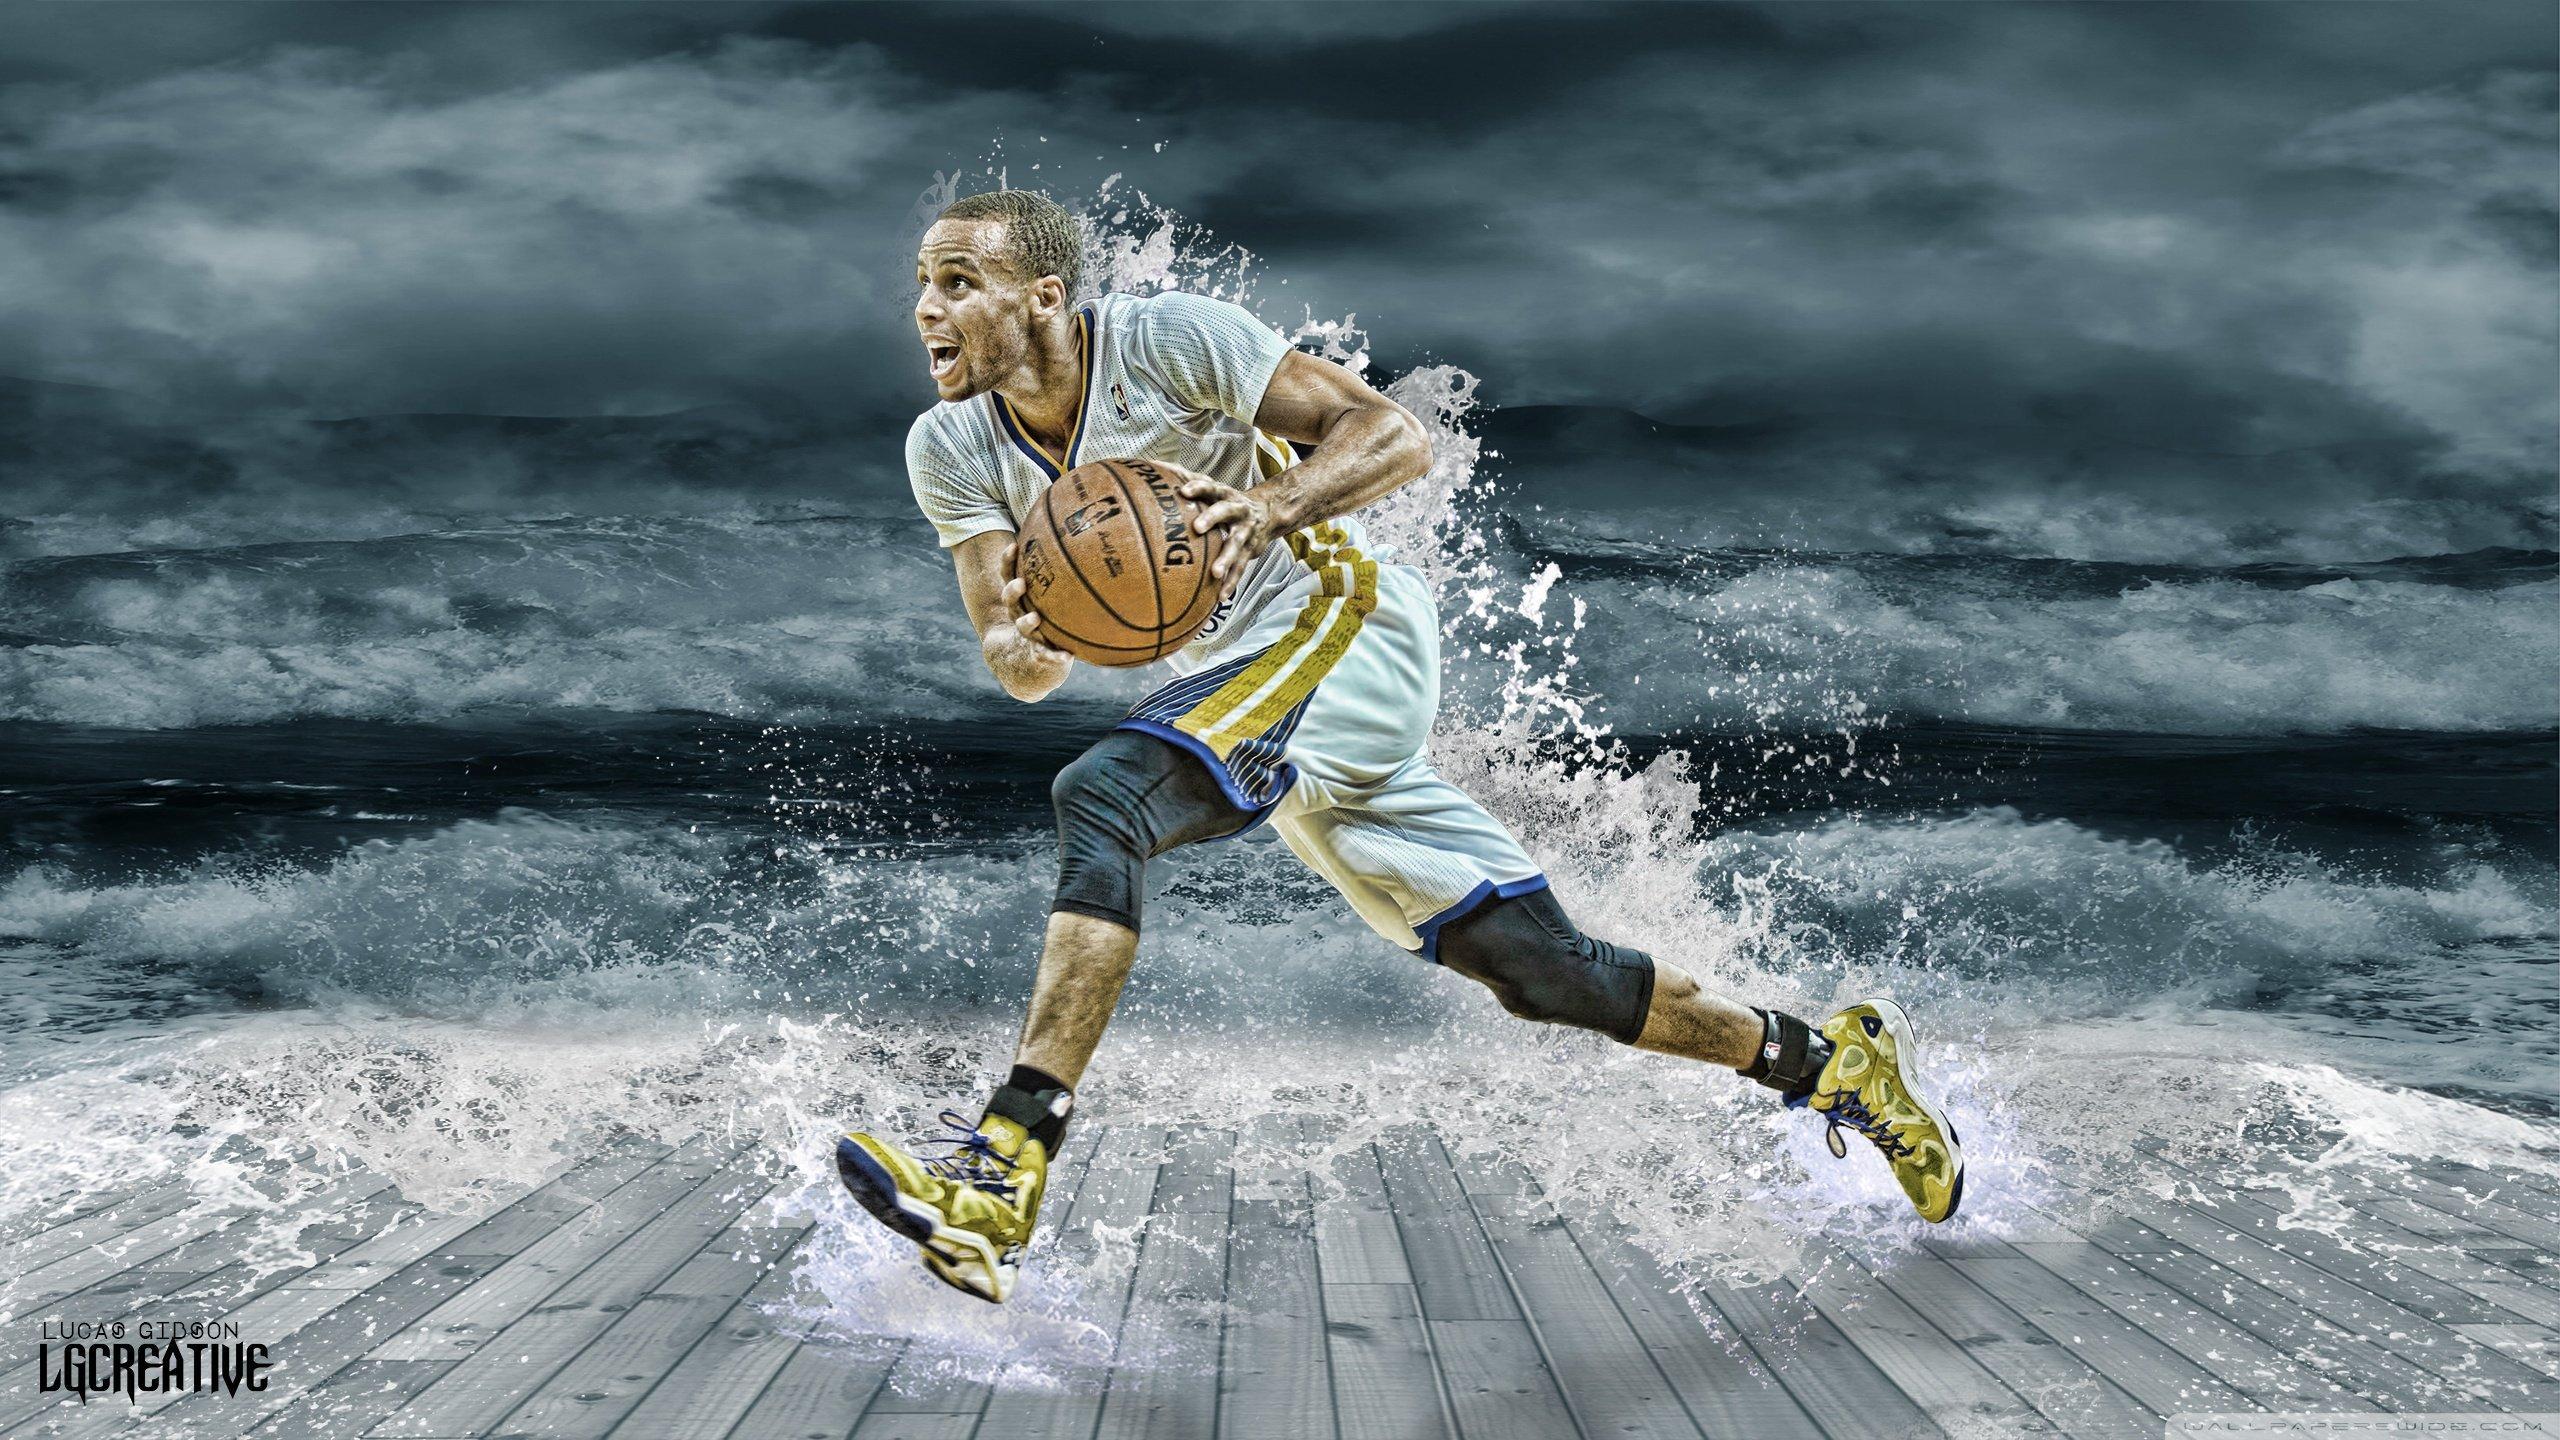 stephen curry splash wallpaper 2560x1440 wallpaper background by 2560x1440